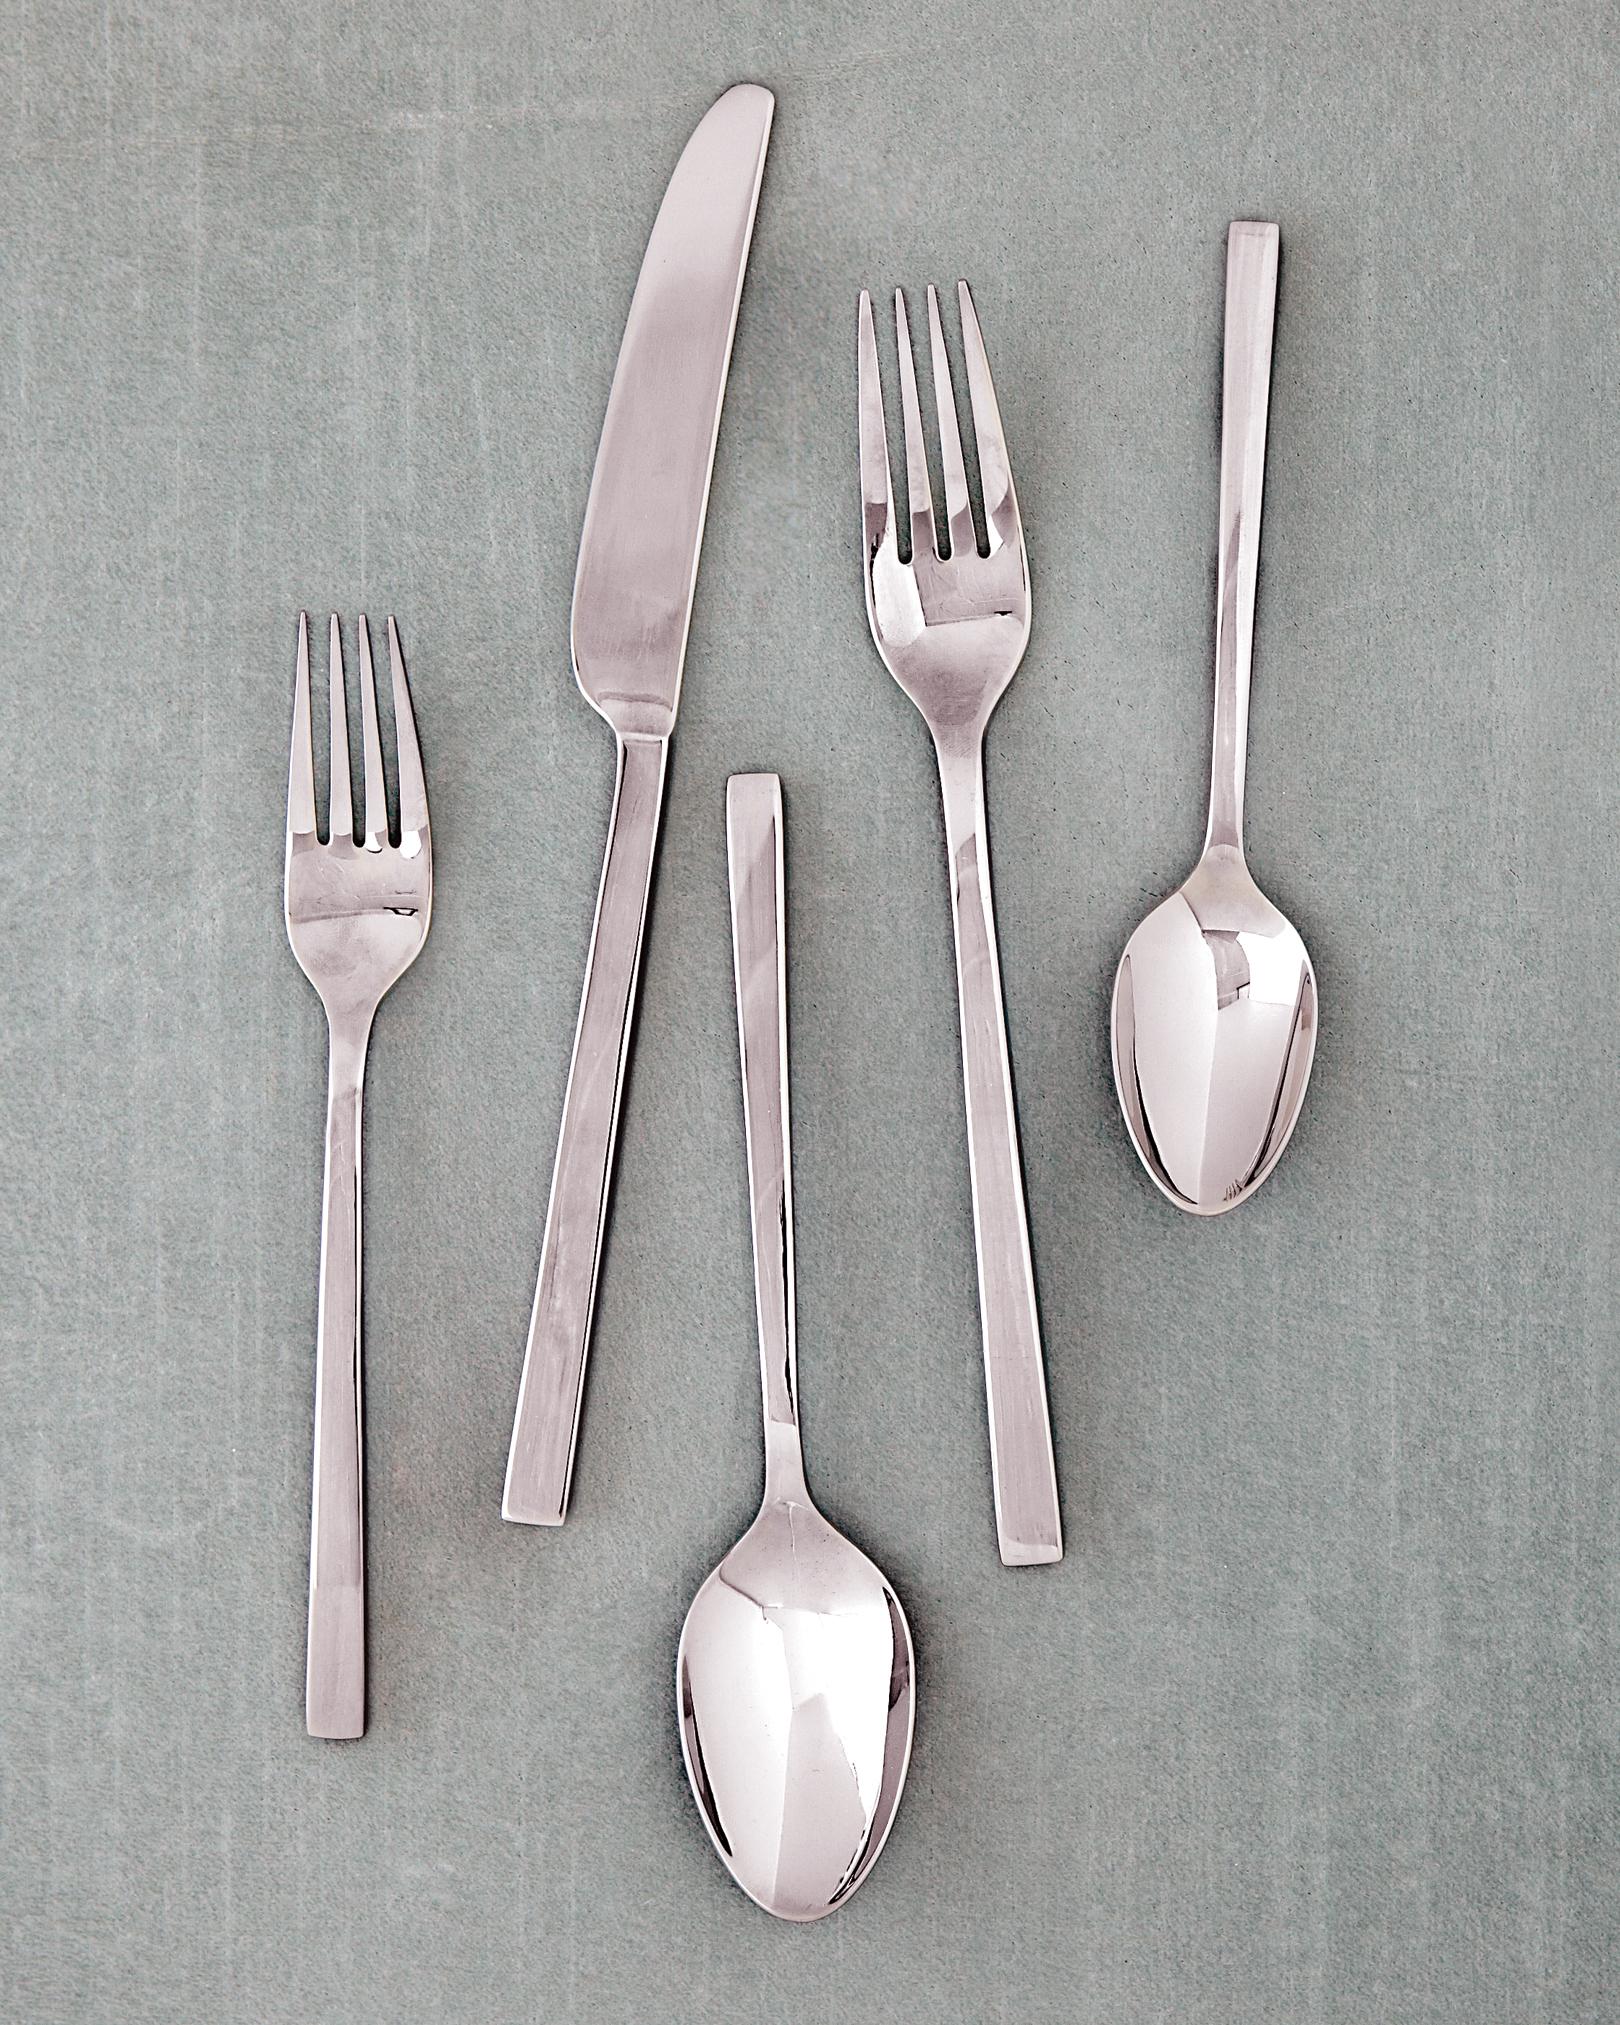 silverware-0811mwd107434.jpg